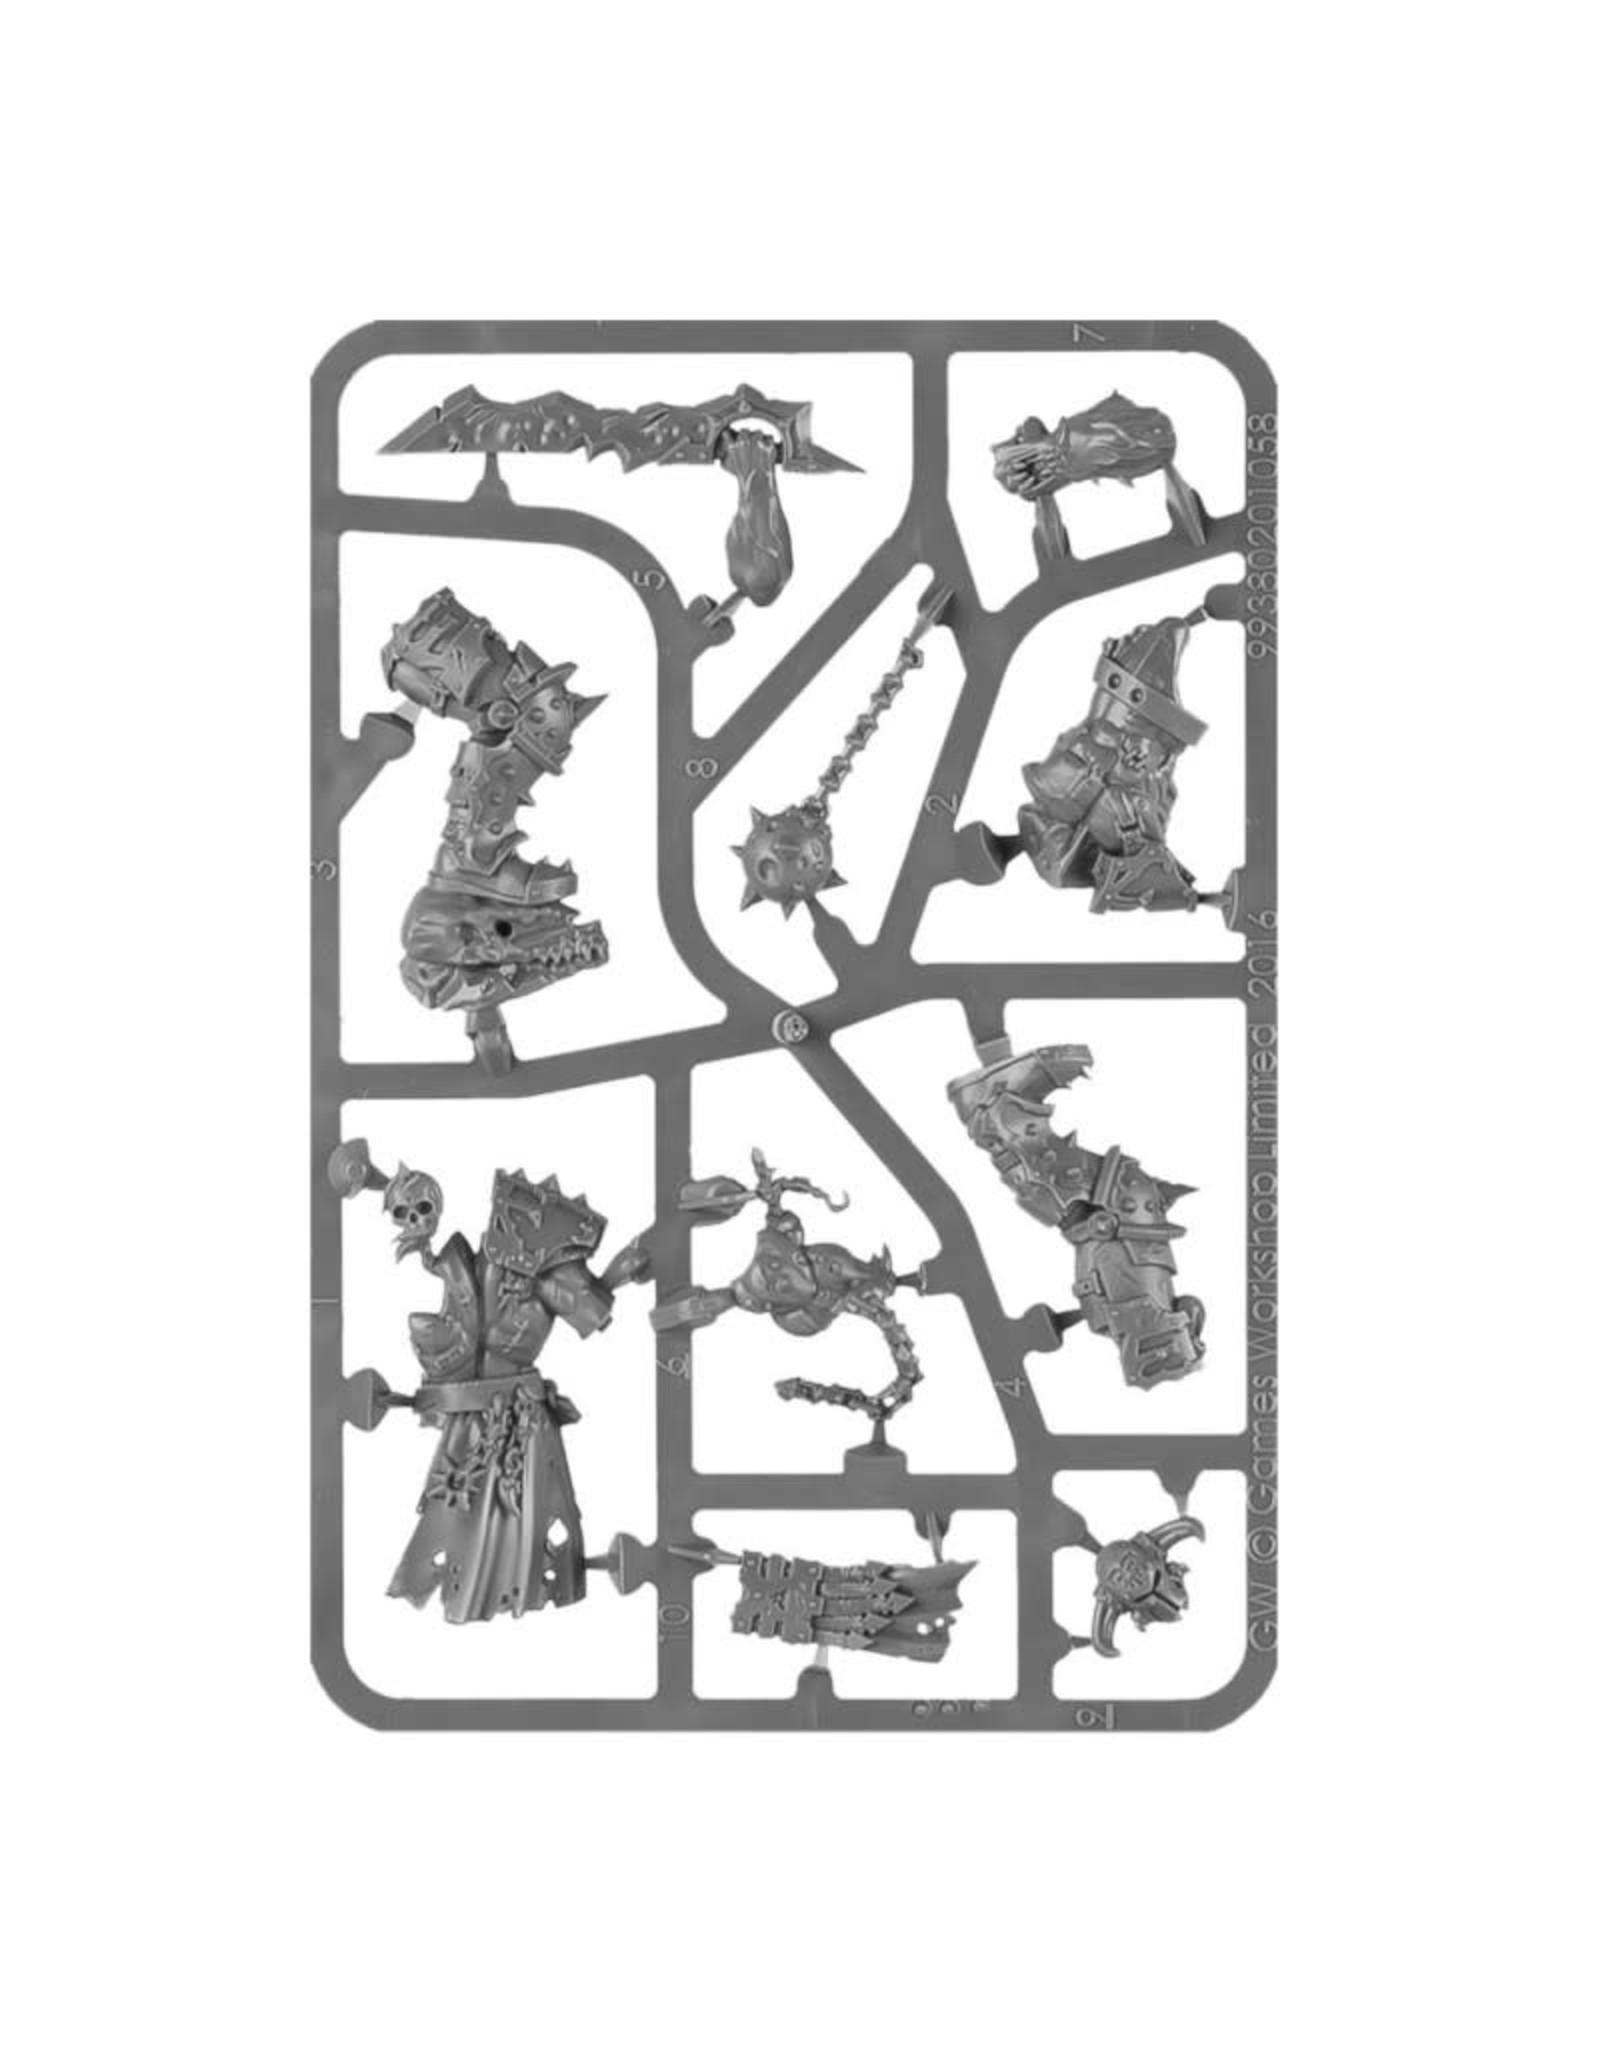 Games Workshop Warhammer Age of Sigmar: Chaos Khorne Bloodbound Slaughterpriest With Hackblade and Wrath-hammer